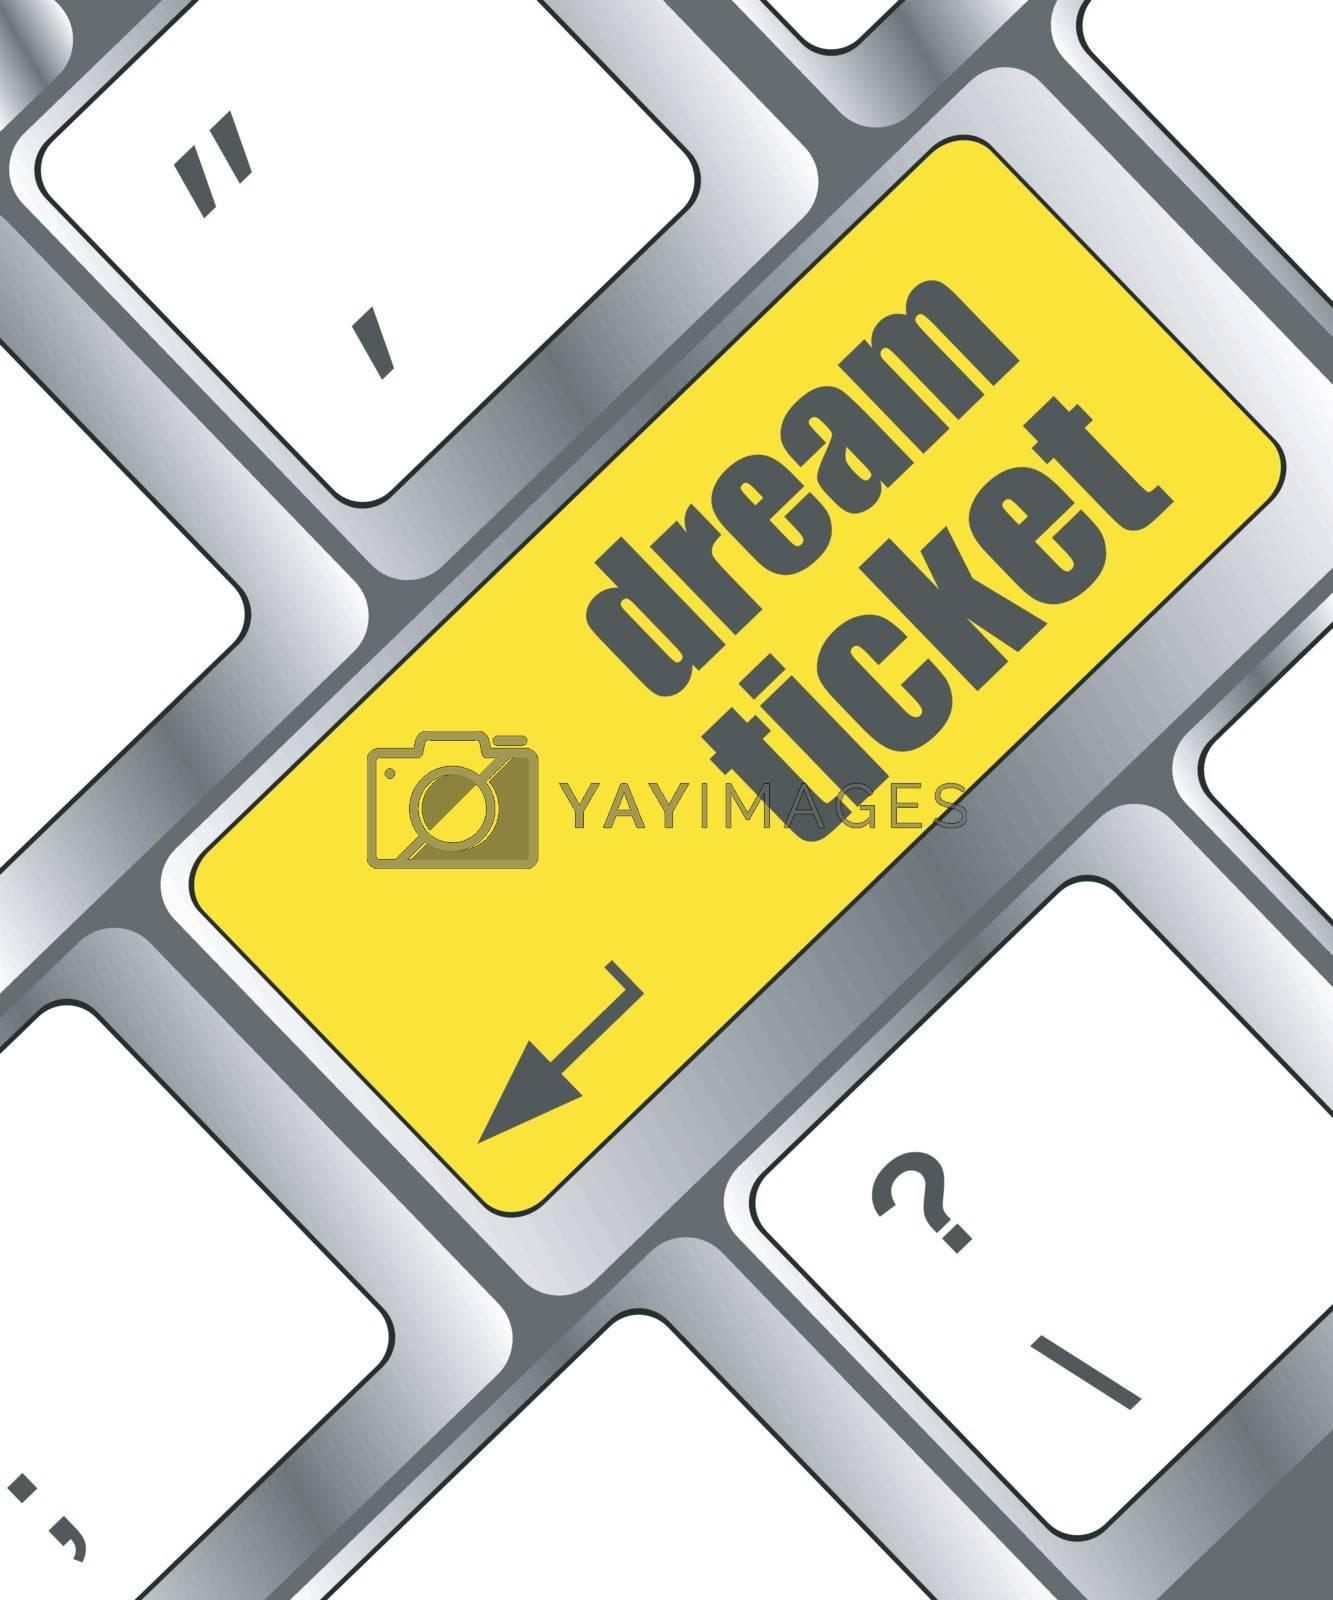 dream ticket button on computer keyboard key